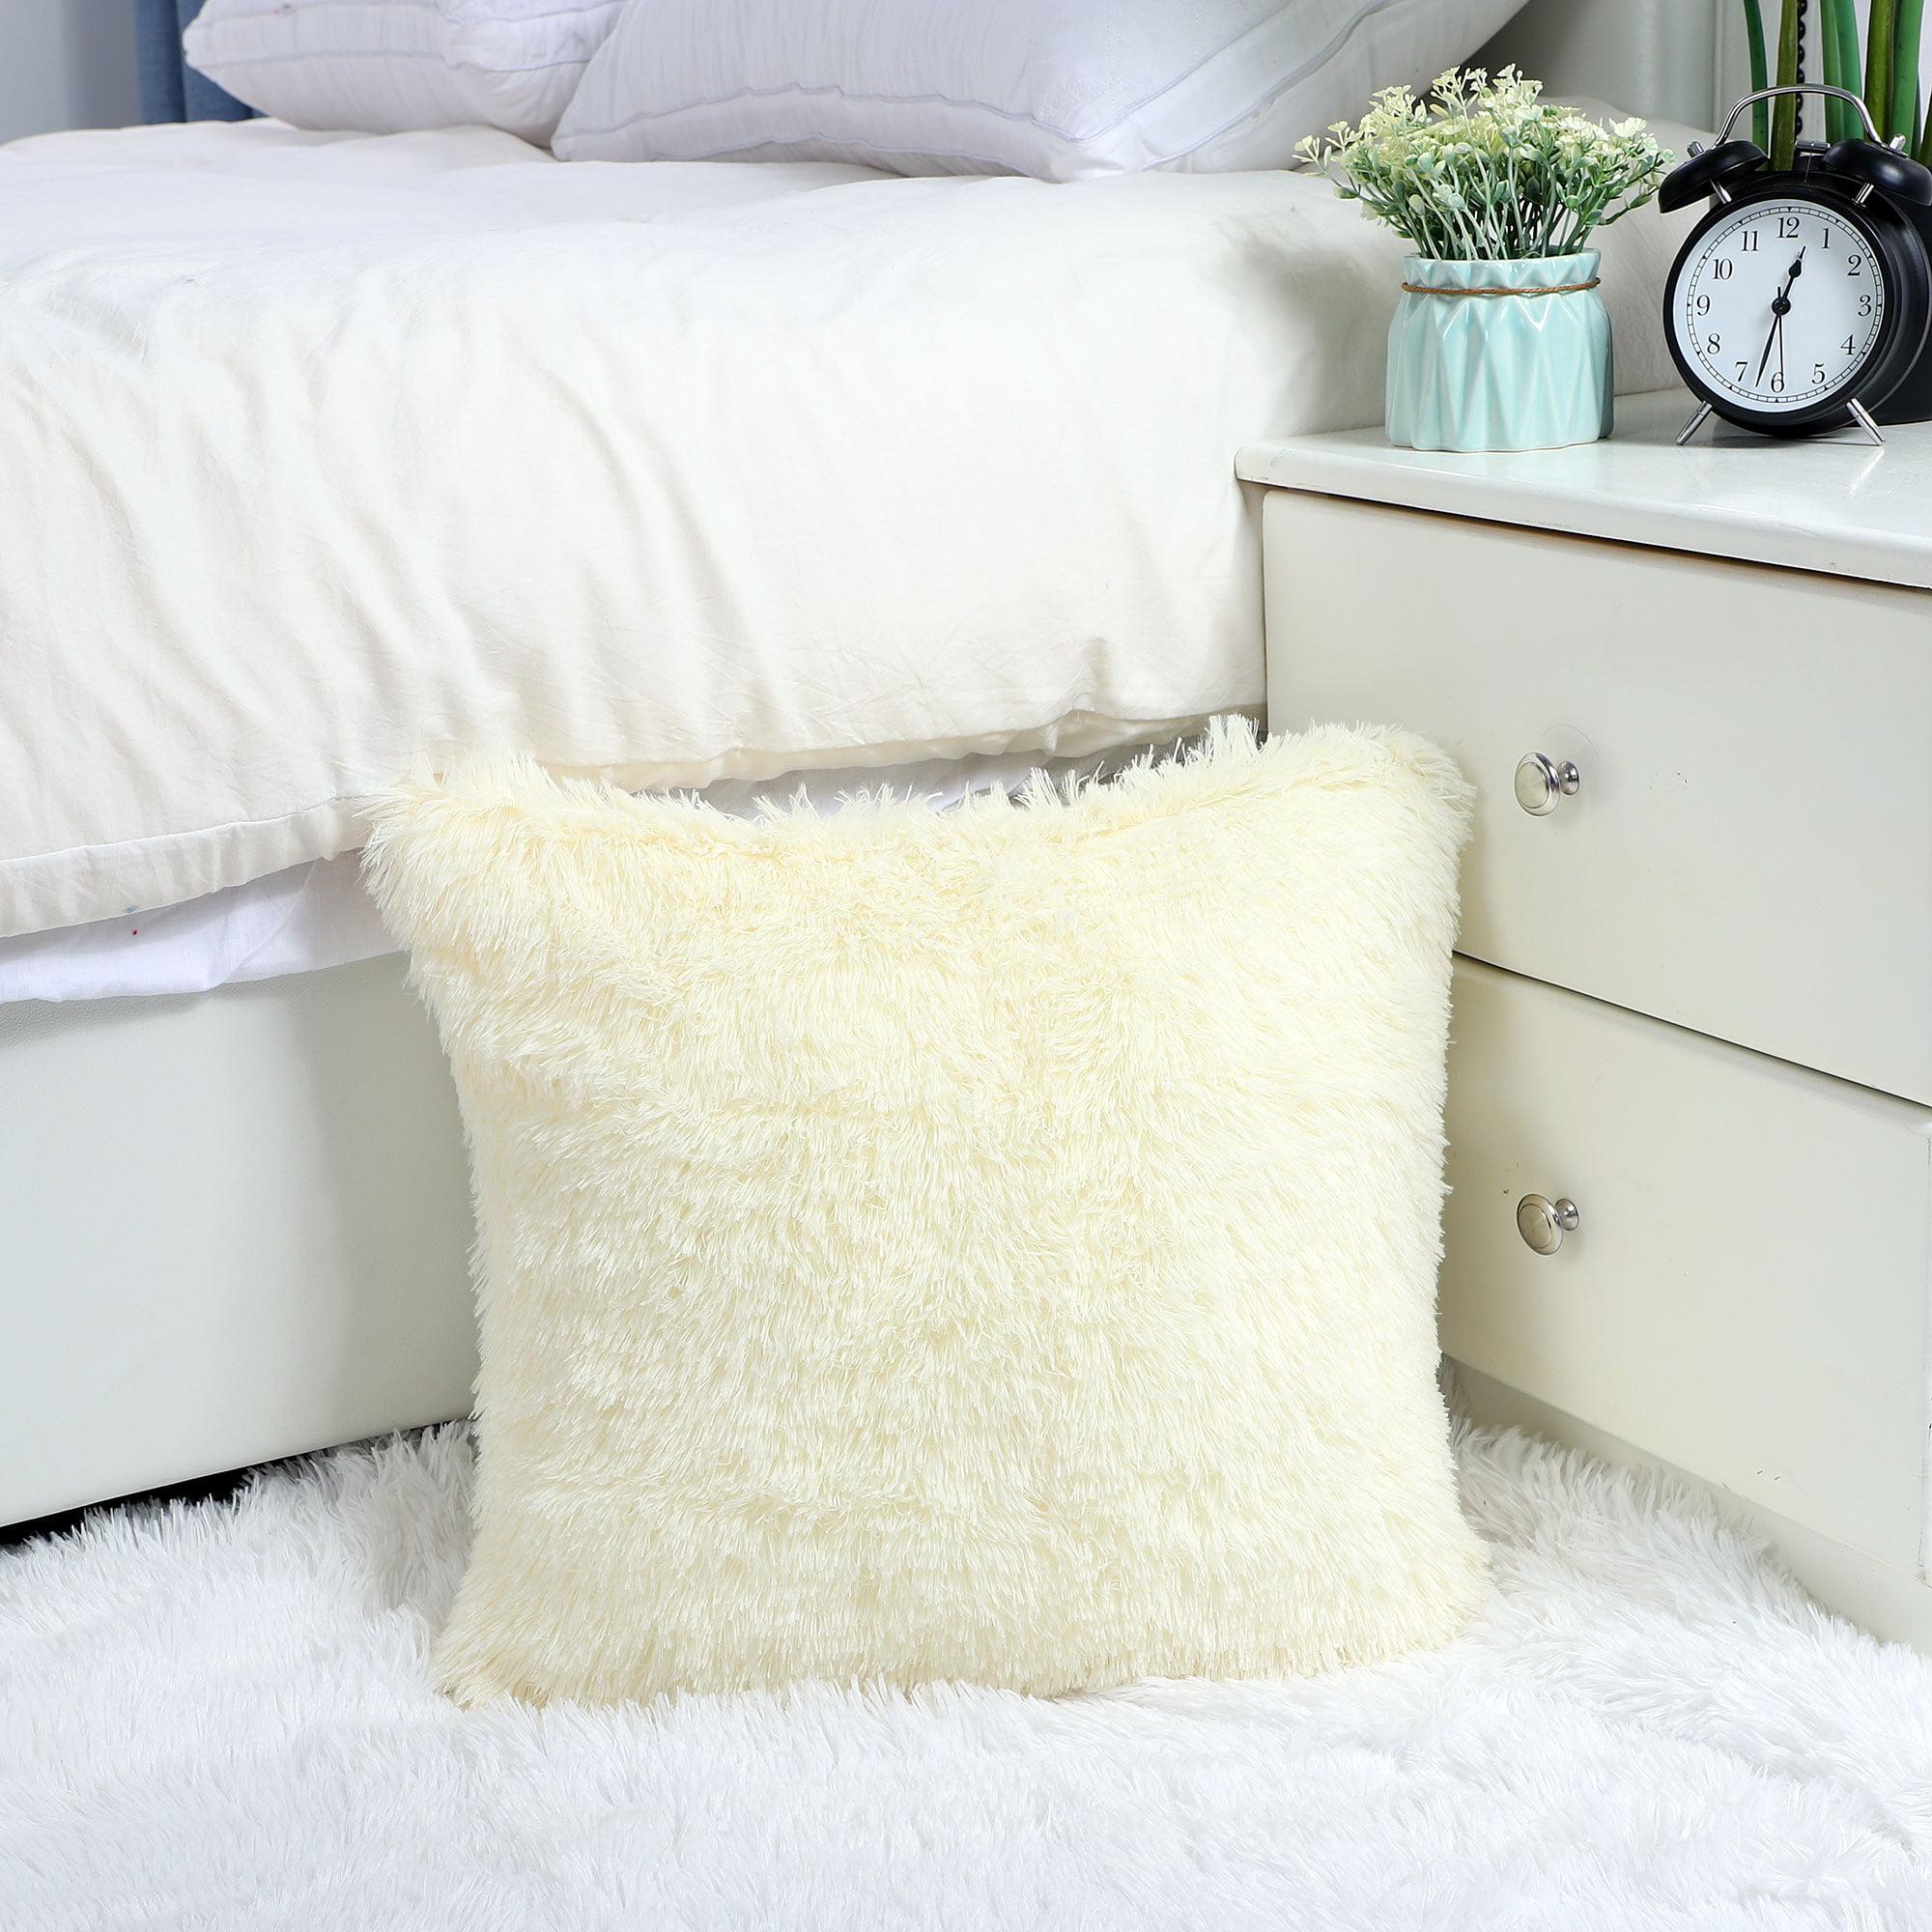 "24"" Throw Pillow Case Faux Fur Fuzzy Cushion Cover Light Yellow - image 4 de 8"